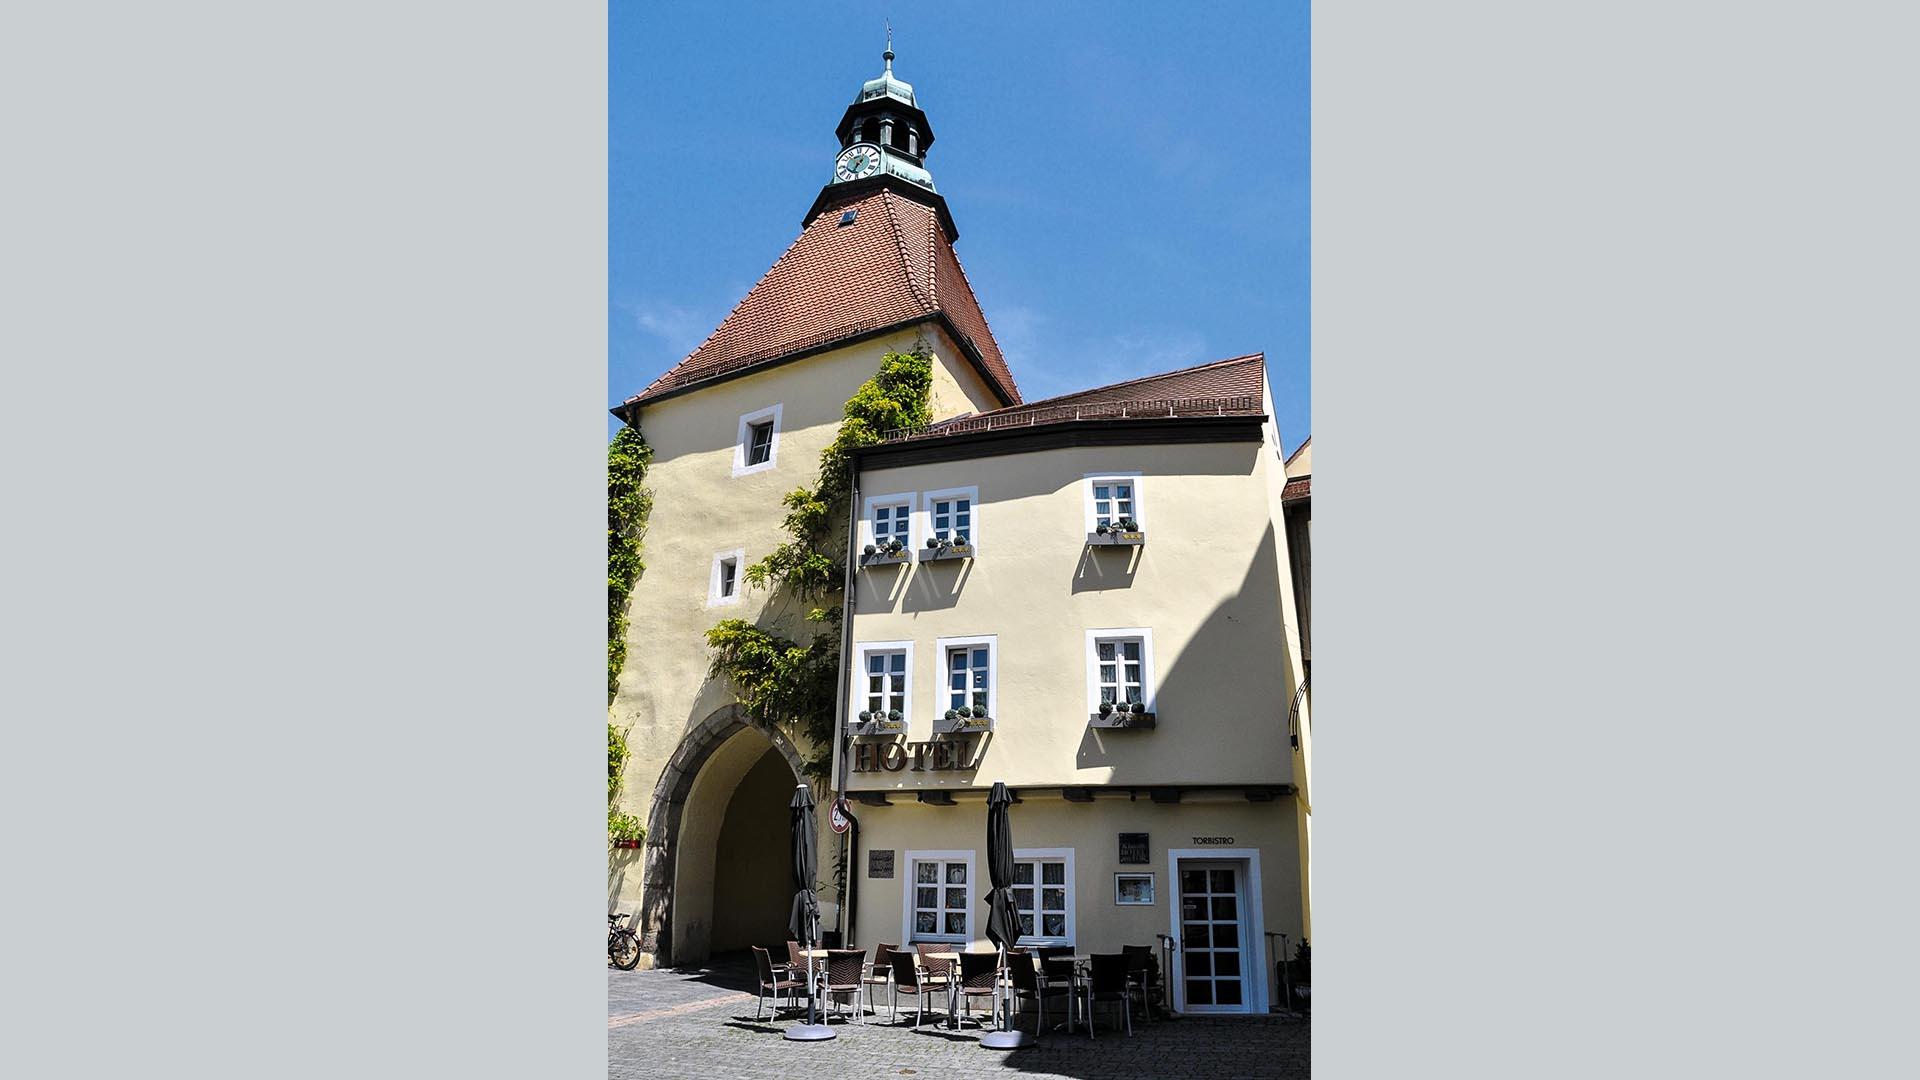 Klassik Hotel am Tor GmbH